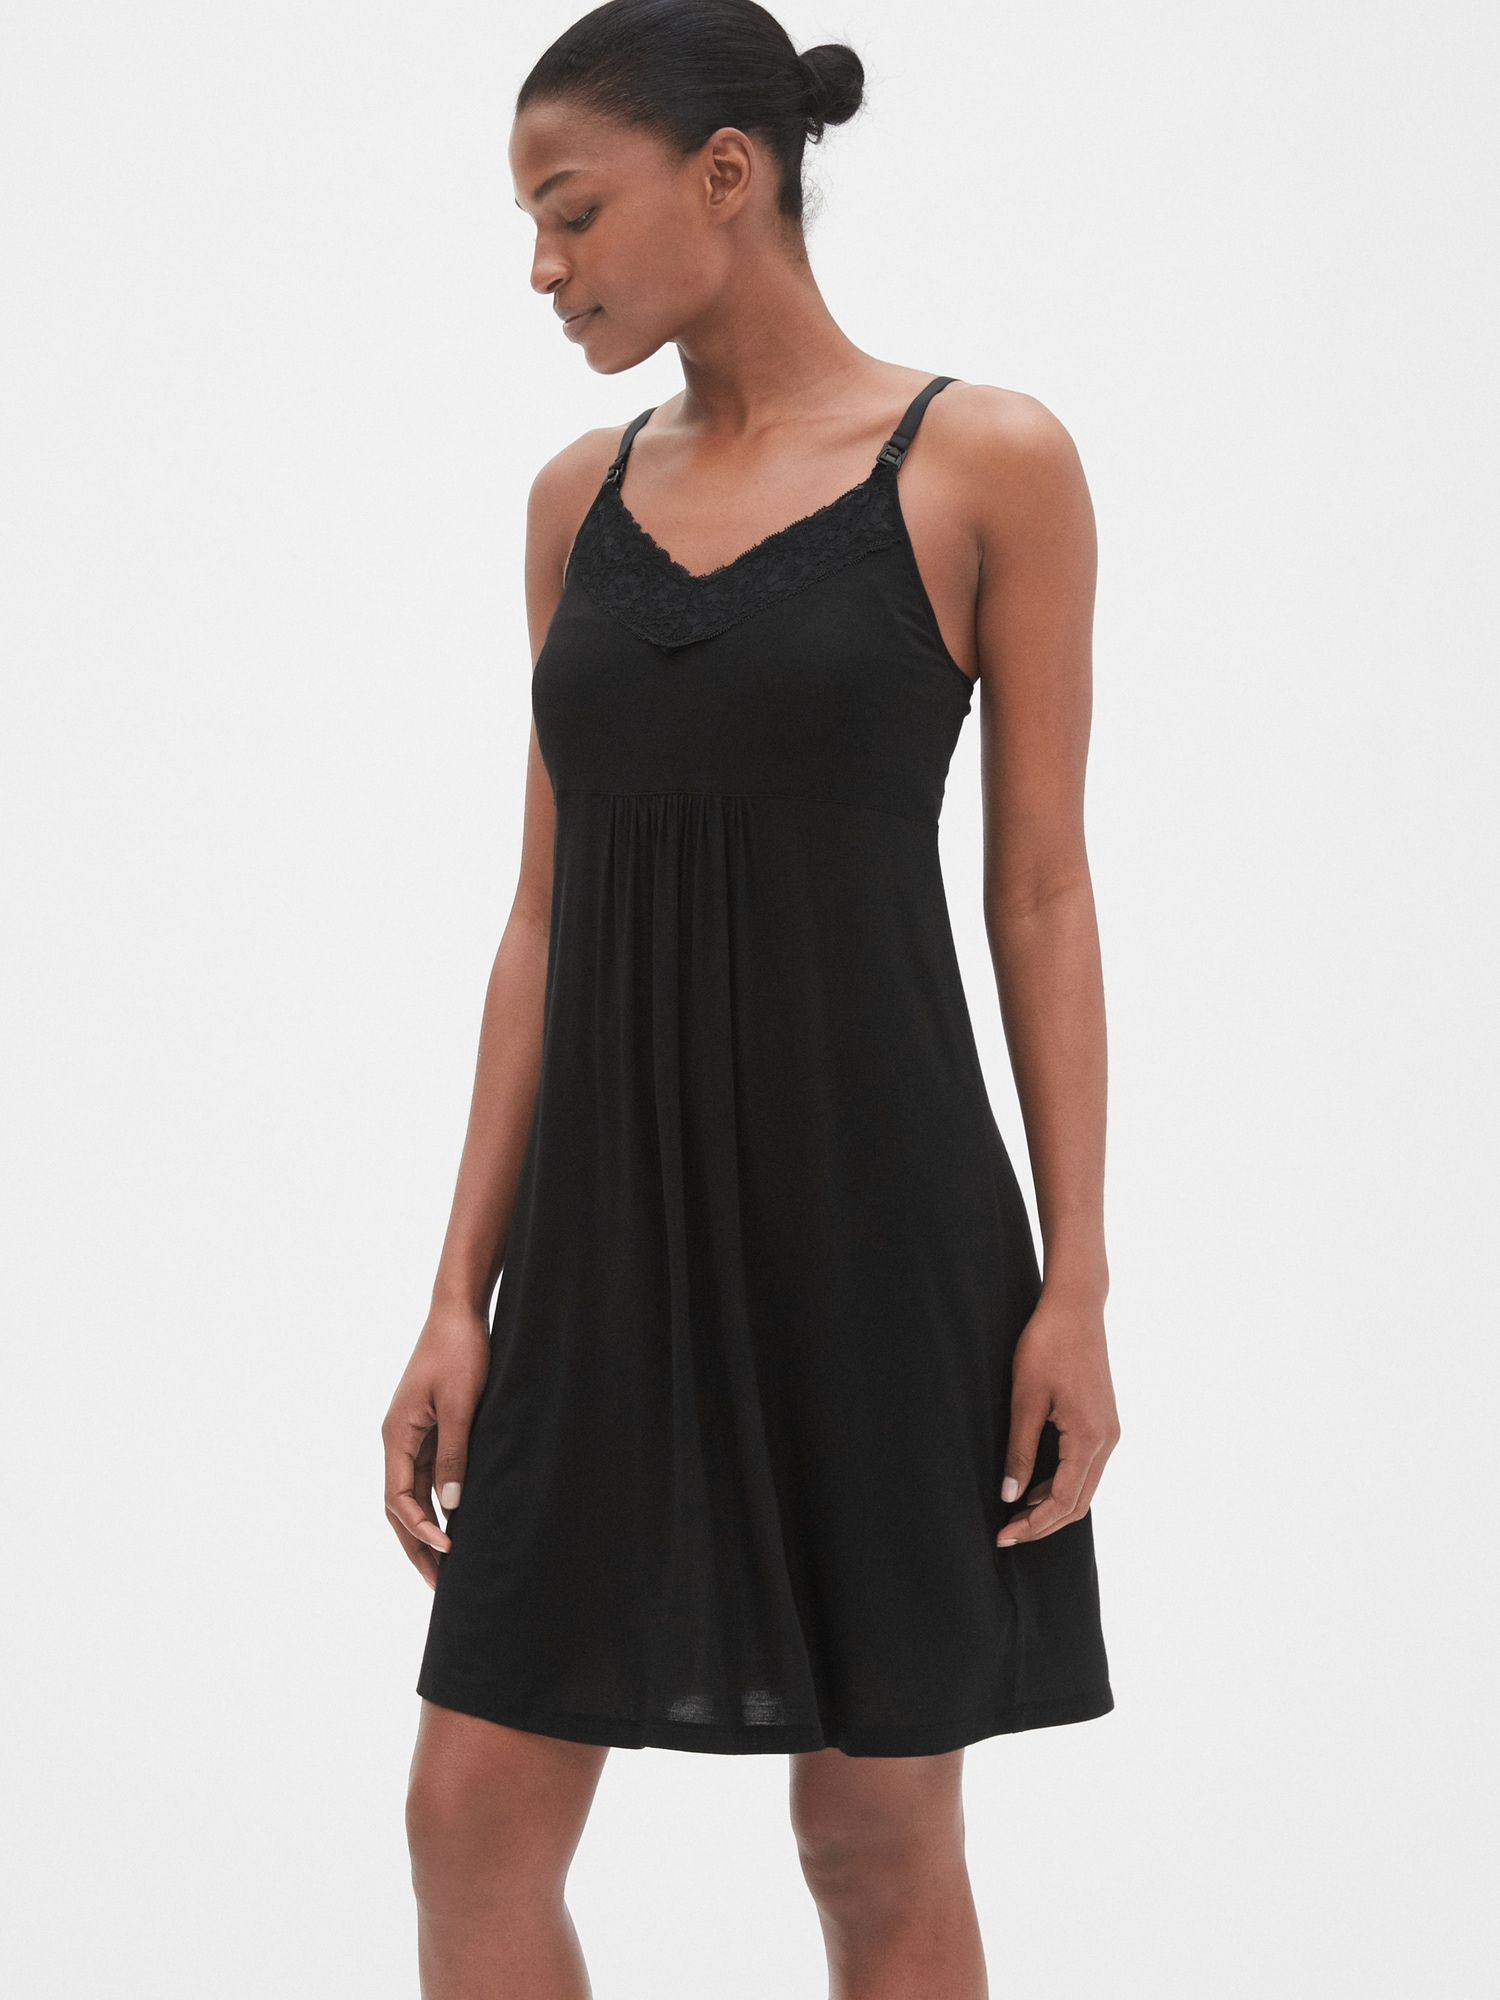 50de812d6b885 Maternity Nursing Nightgown | Gap